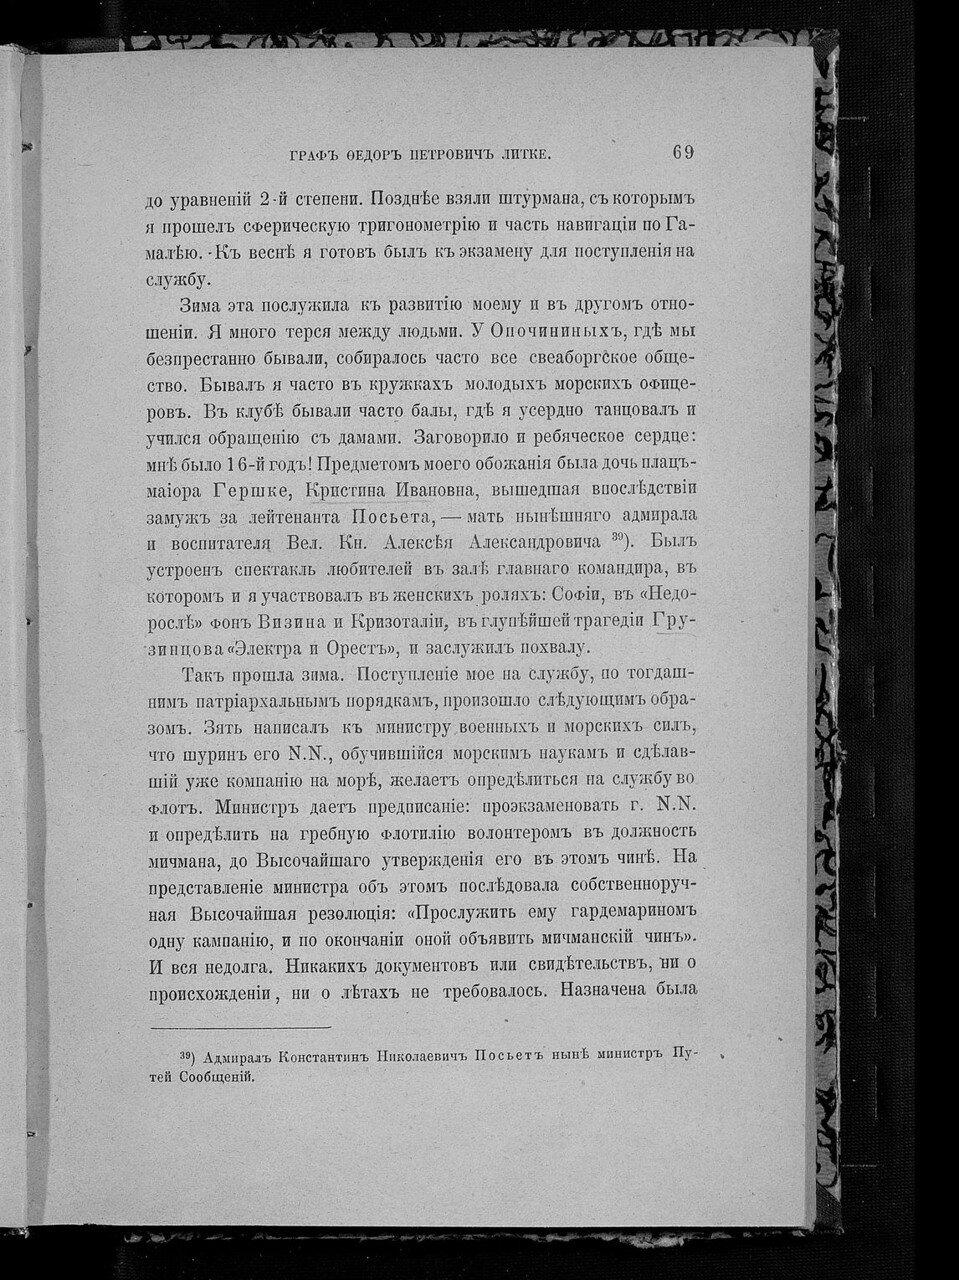 https://img-fotki.yandex.ru/get/893194/199368979.d4/0_21dde5_fa596ba4_XXXL.jpg